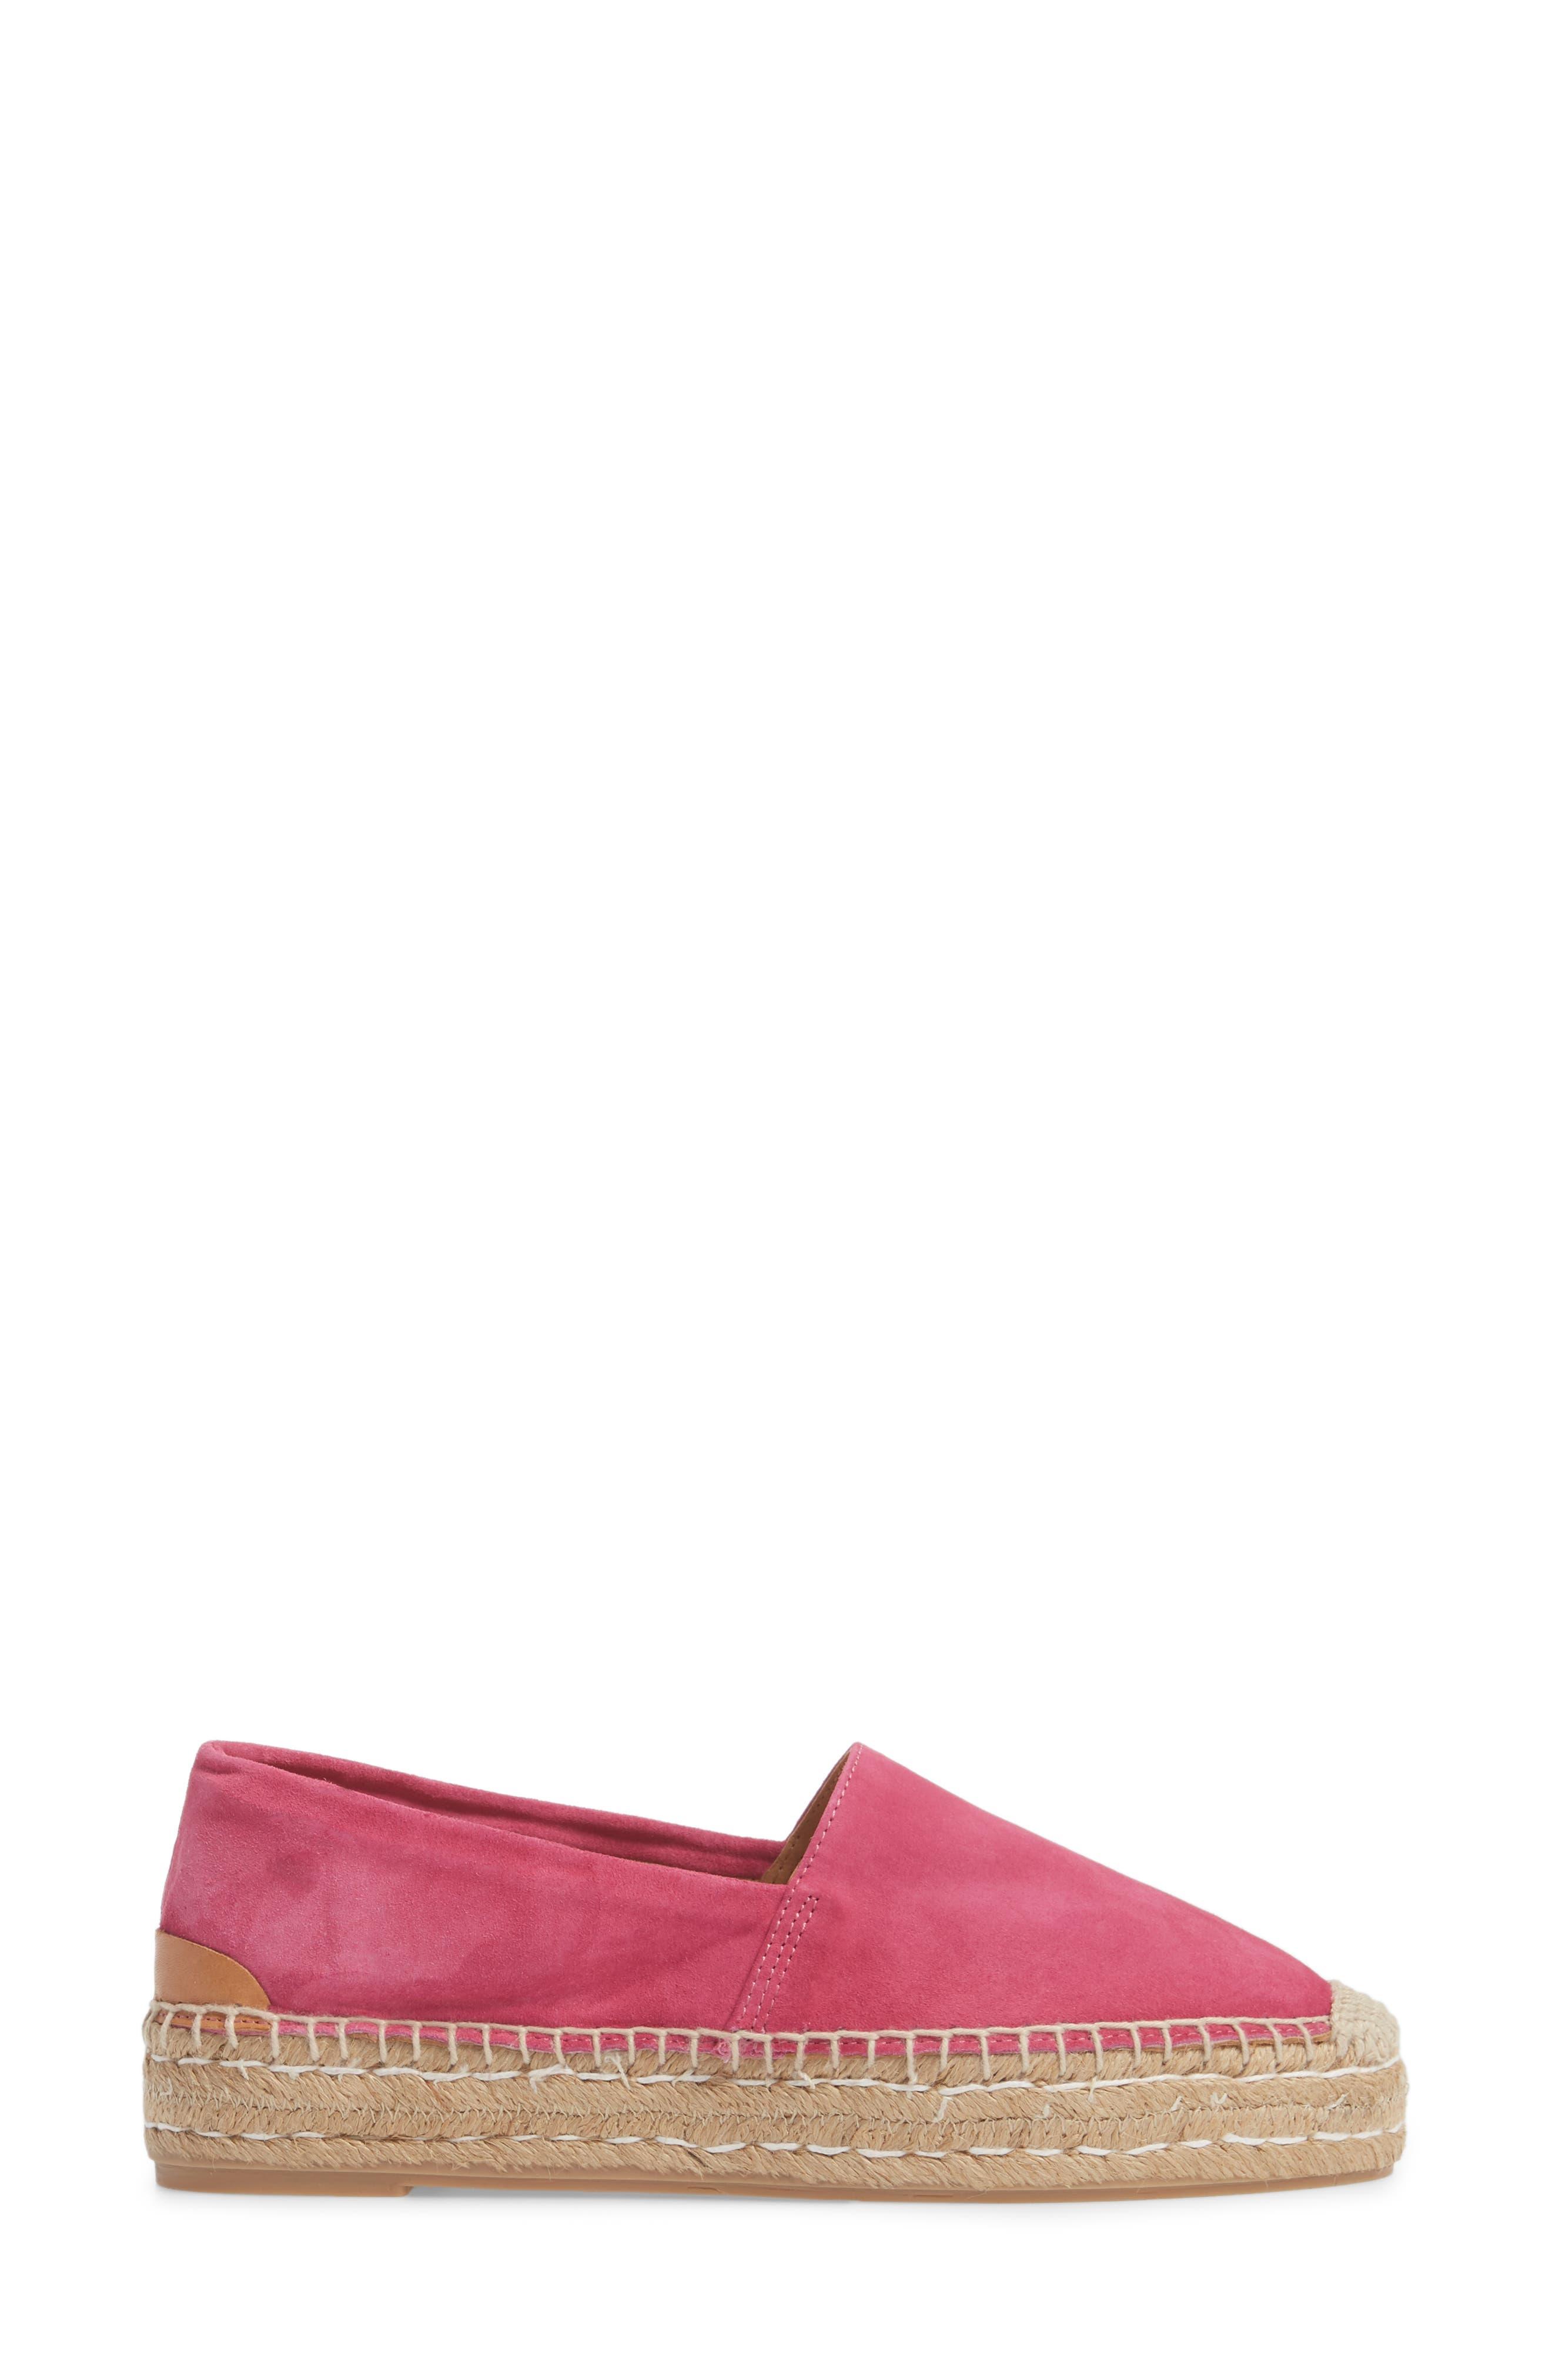 Abigail Espadrille Slip-On,                             Alternate thumbnail 3, color,                             Hot Pink Suede